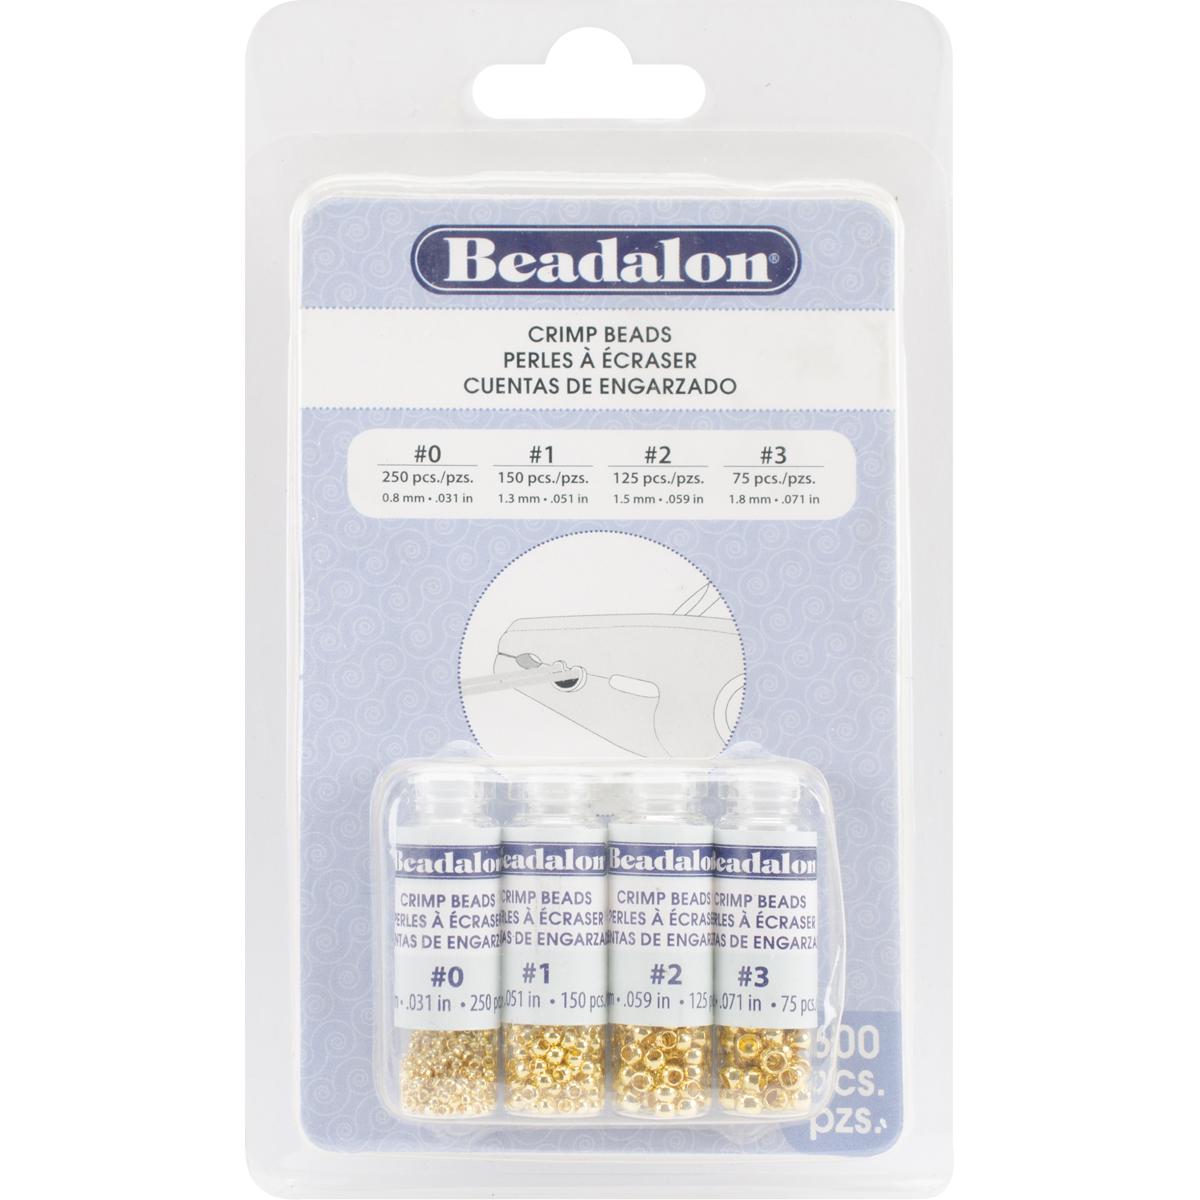 Beadalon Crimp Beads Gold Assorted #0,#1,#2,#3